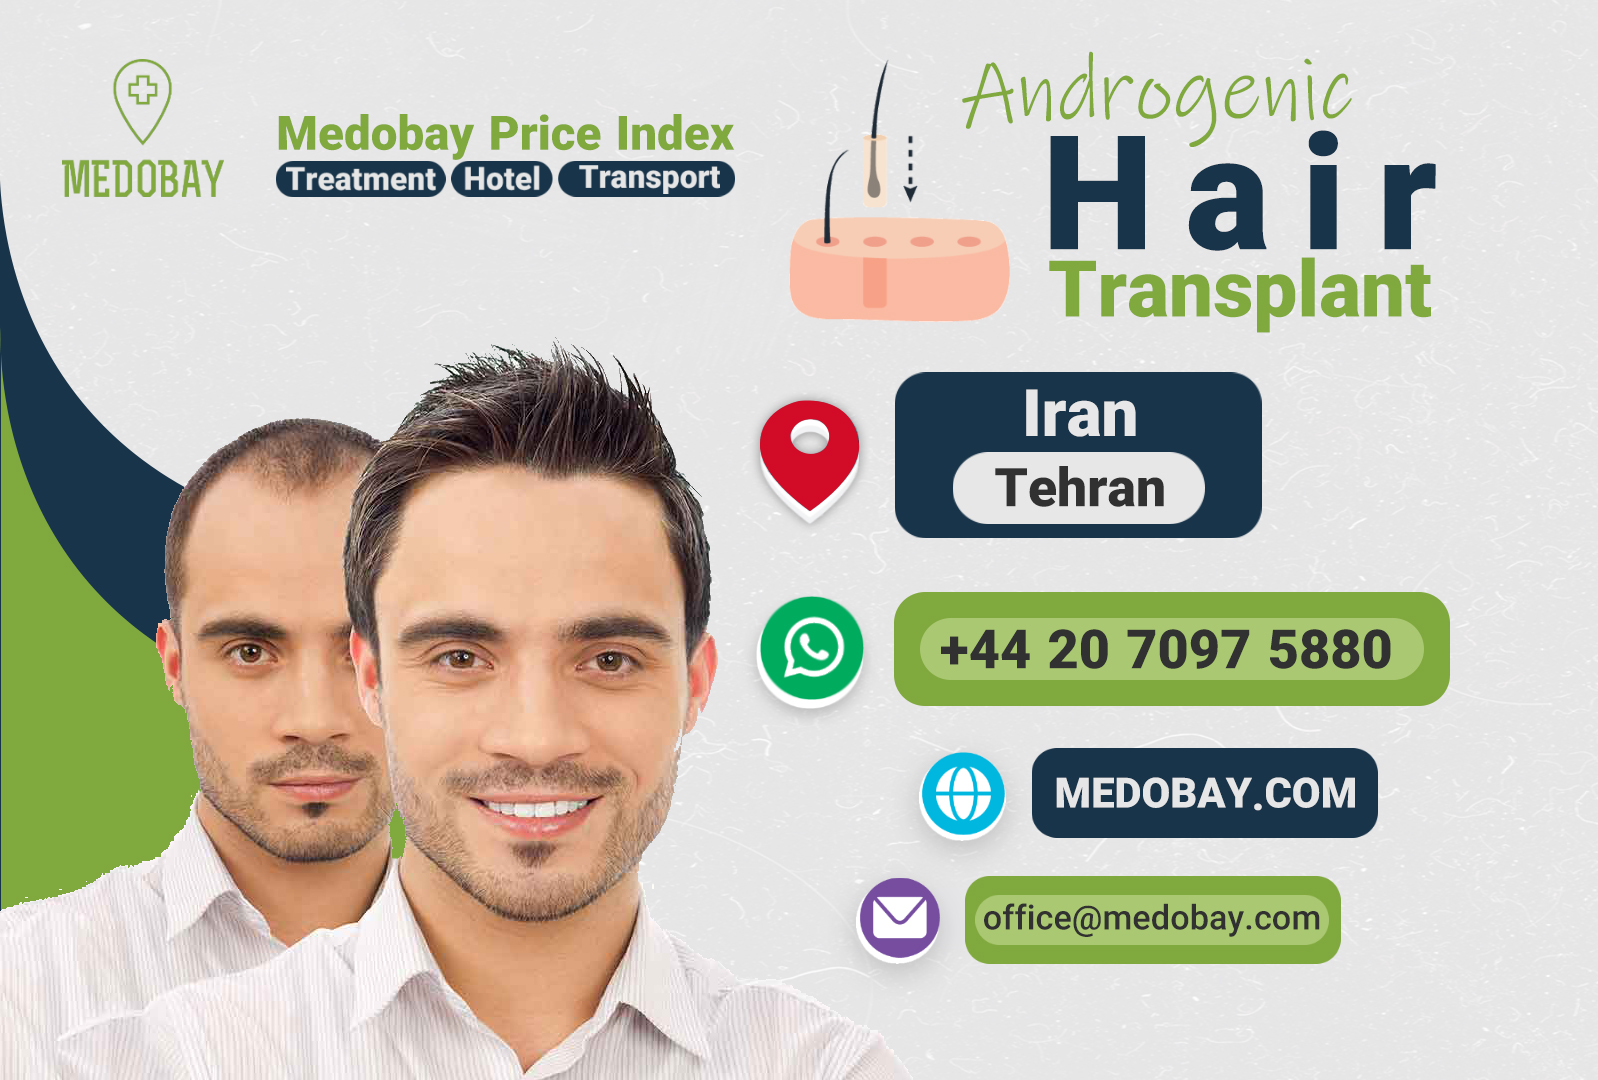 Androgenic Hair Transplant Tehran